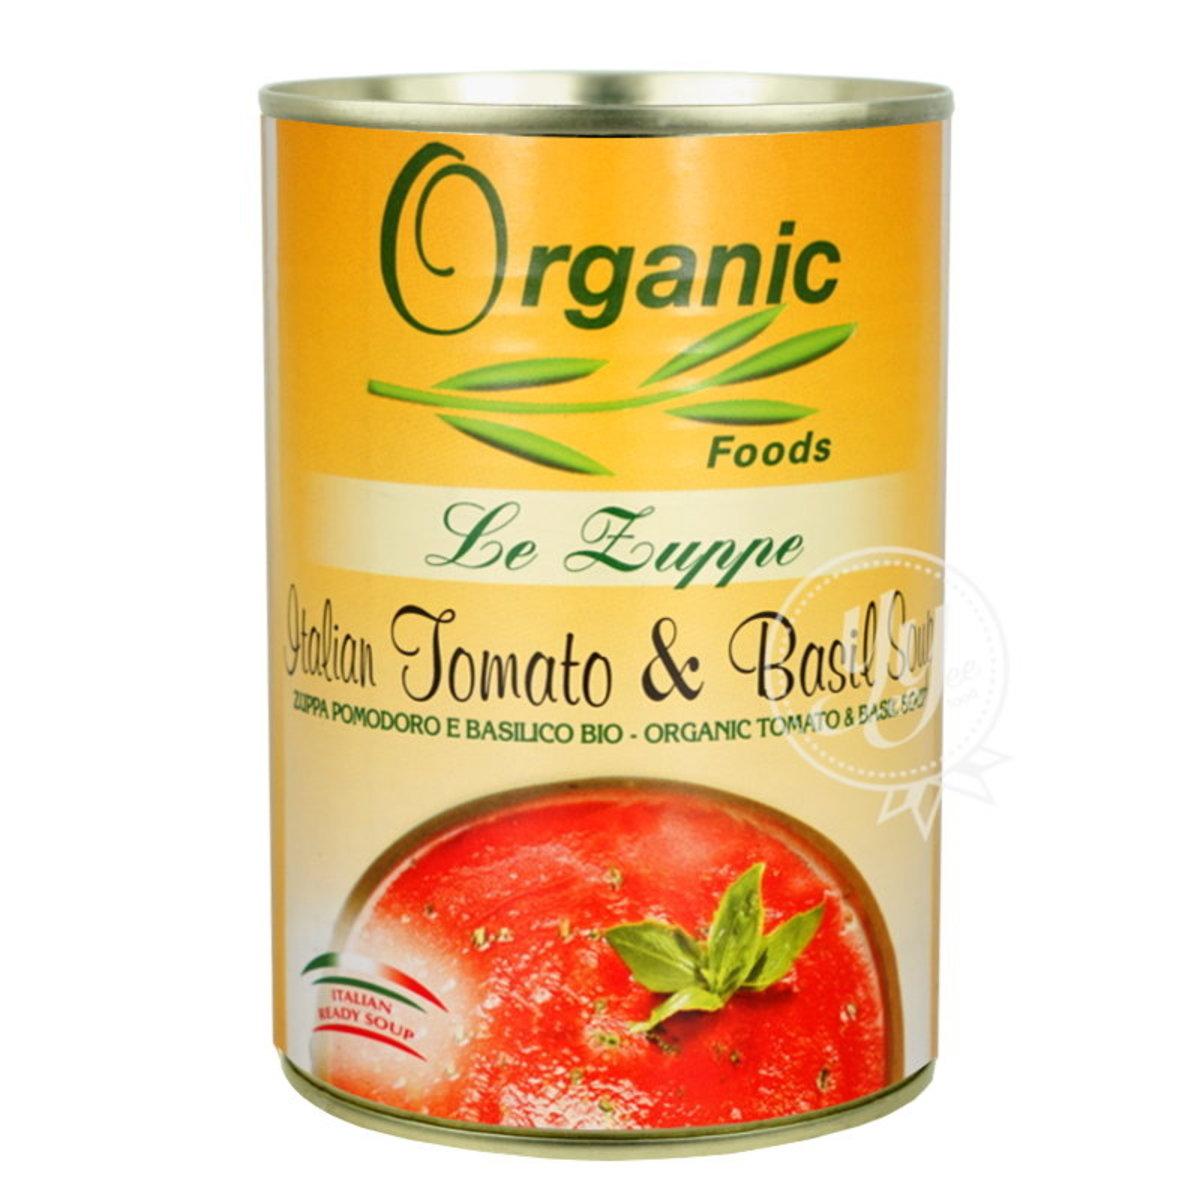 Organic Italian Tomato & Basil Soup 400g